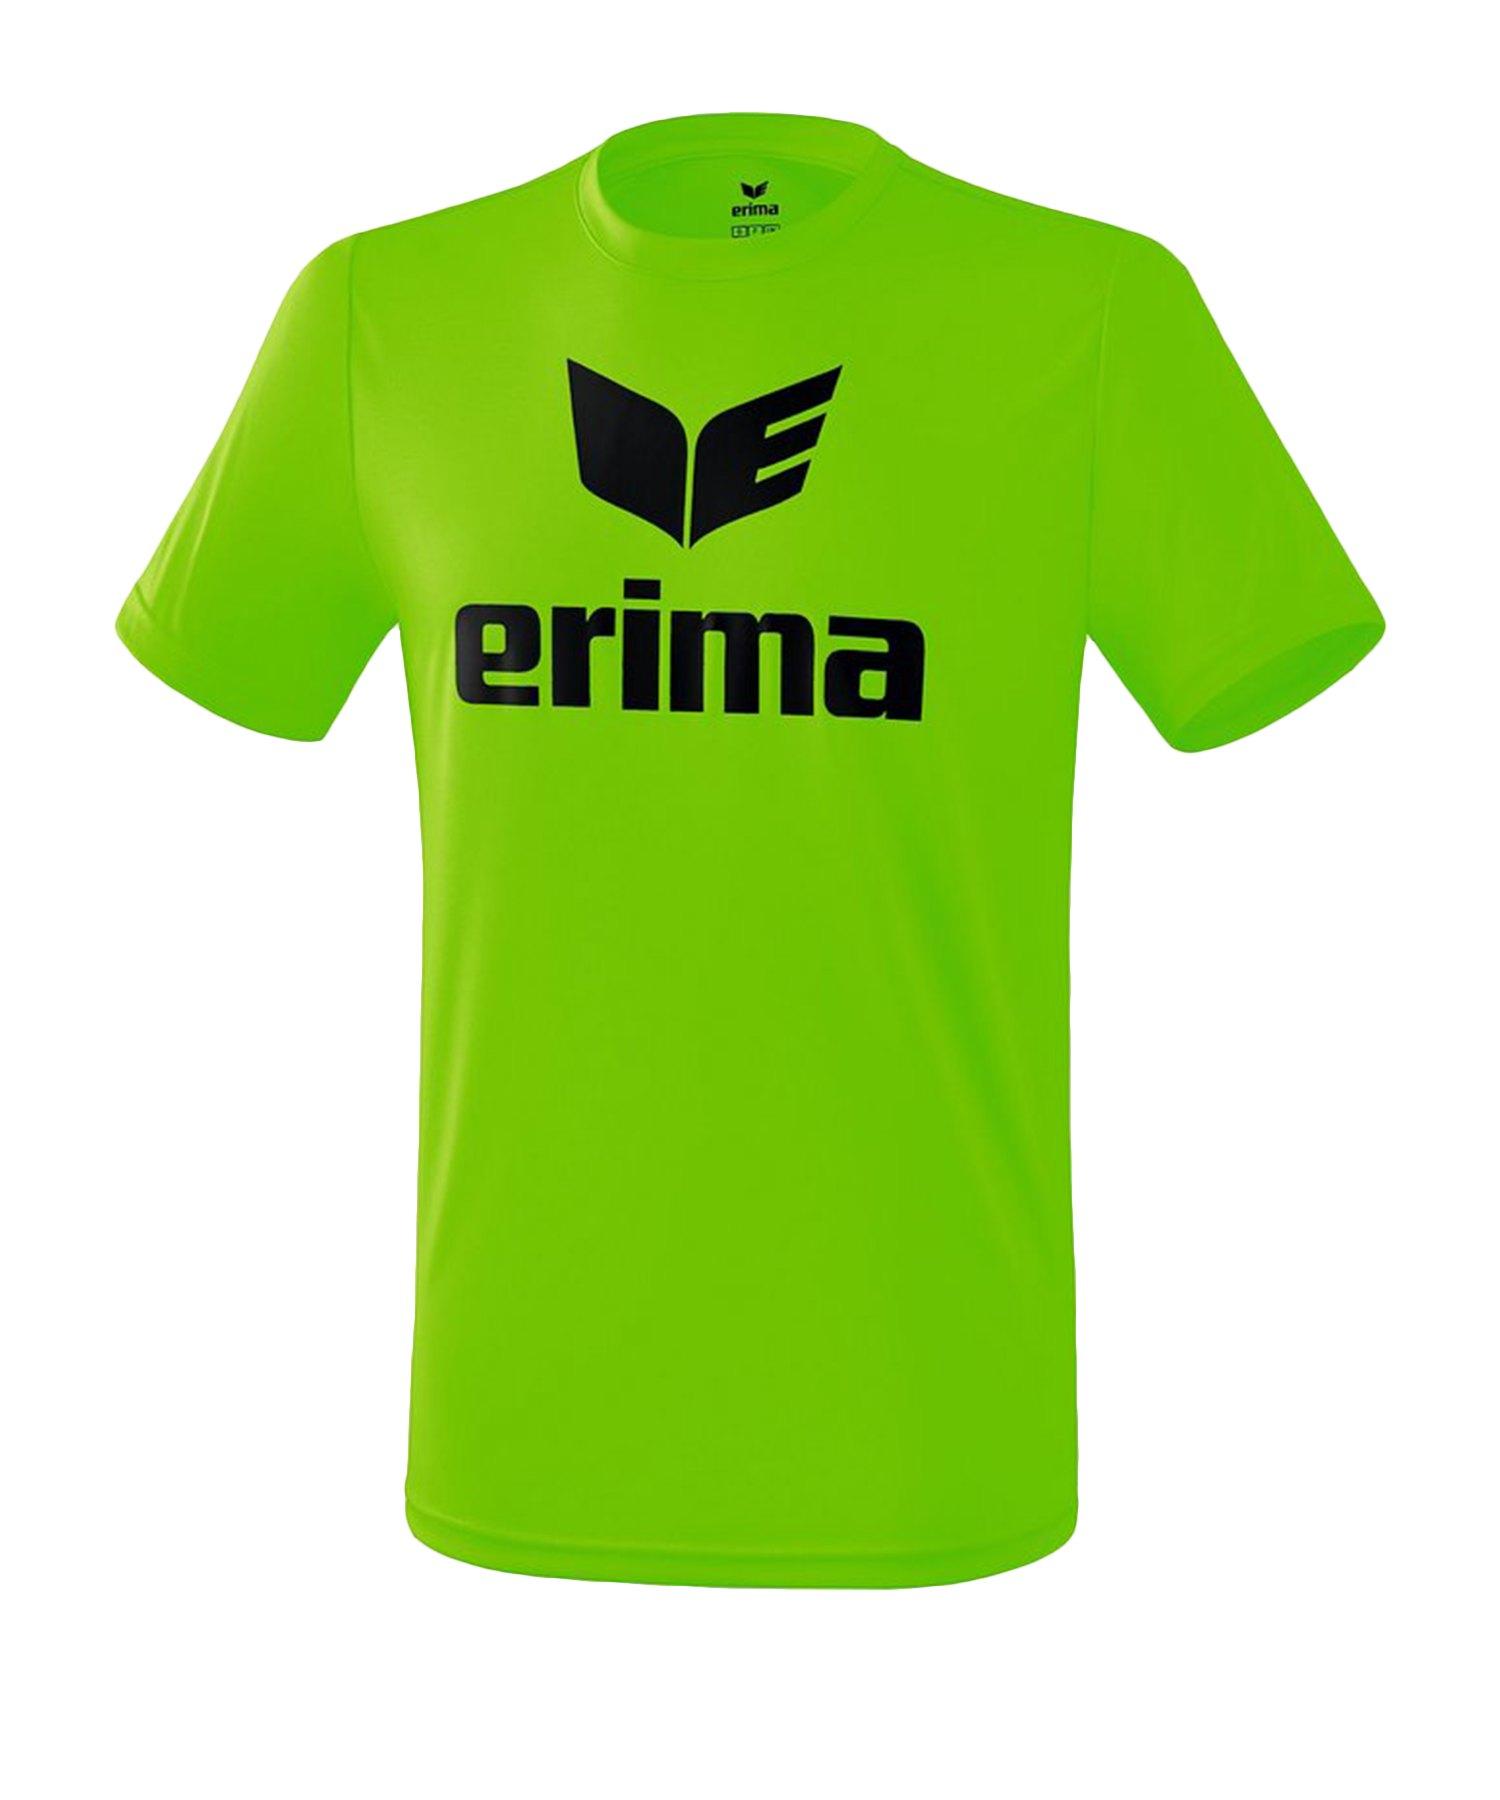 Erima Funktions Promo T-Shirt Kids Grün Schwarz - Gruen